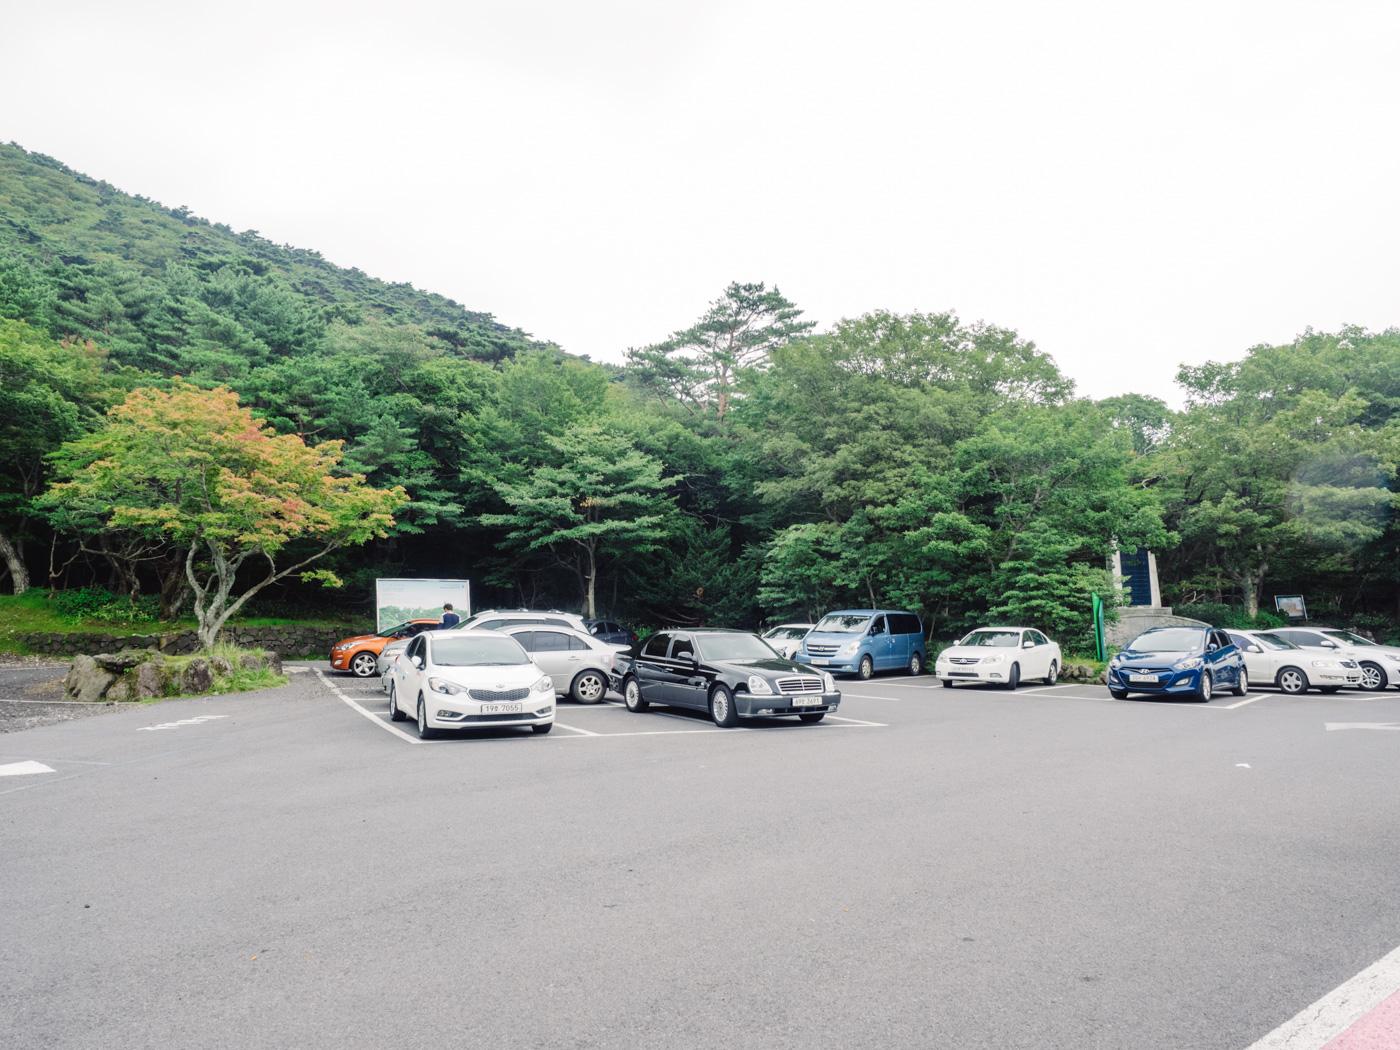 Korea - Mt Hallasan - Carpark